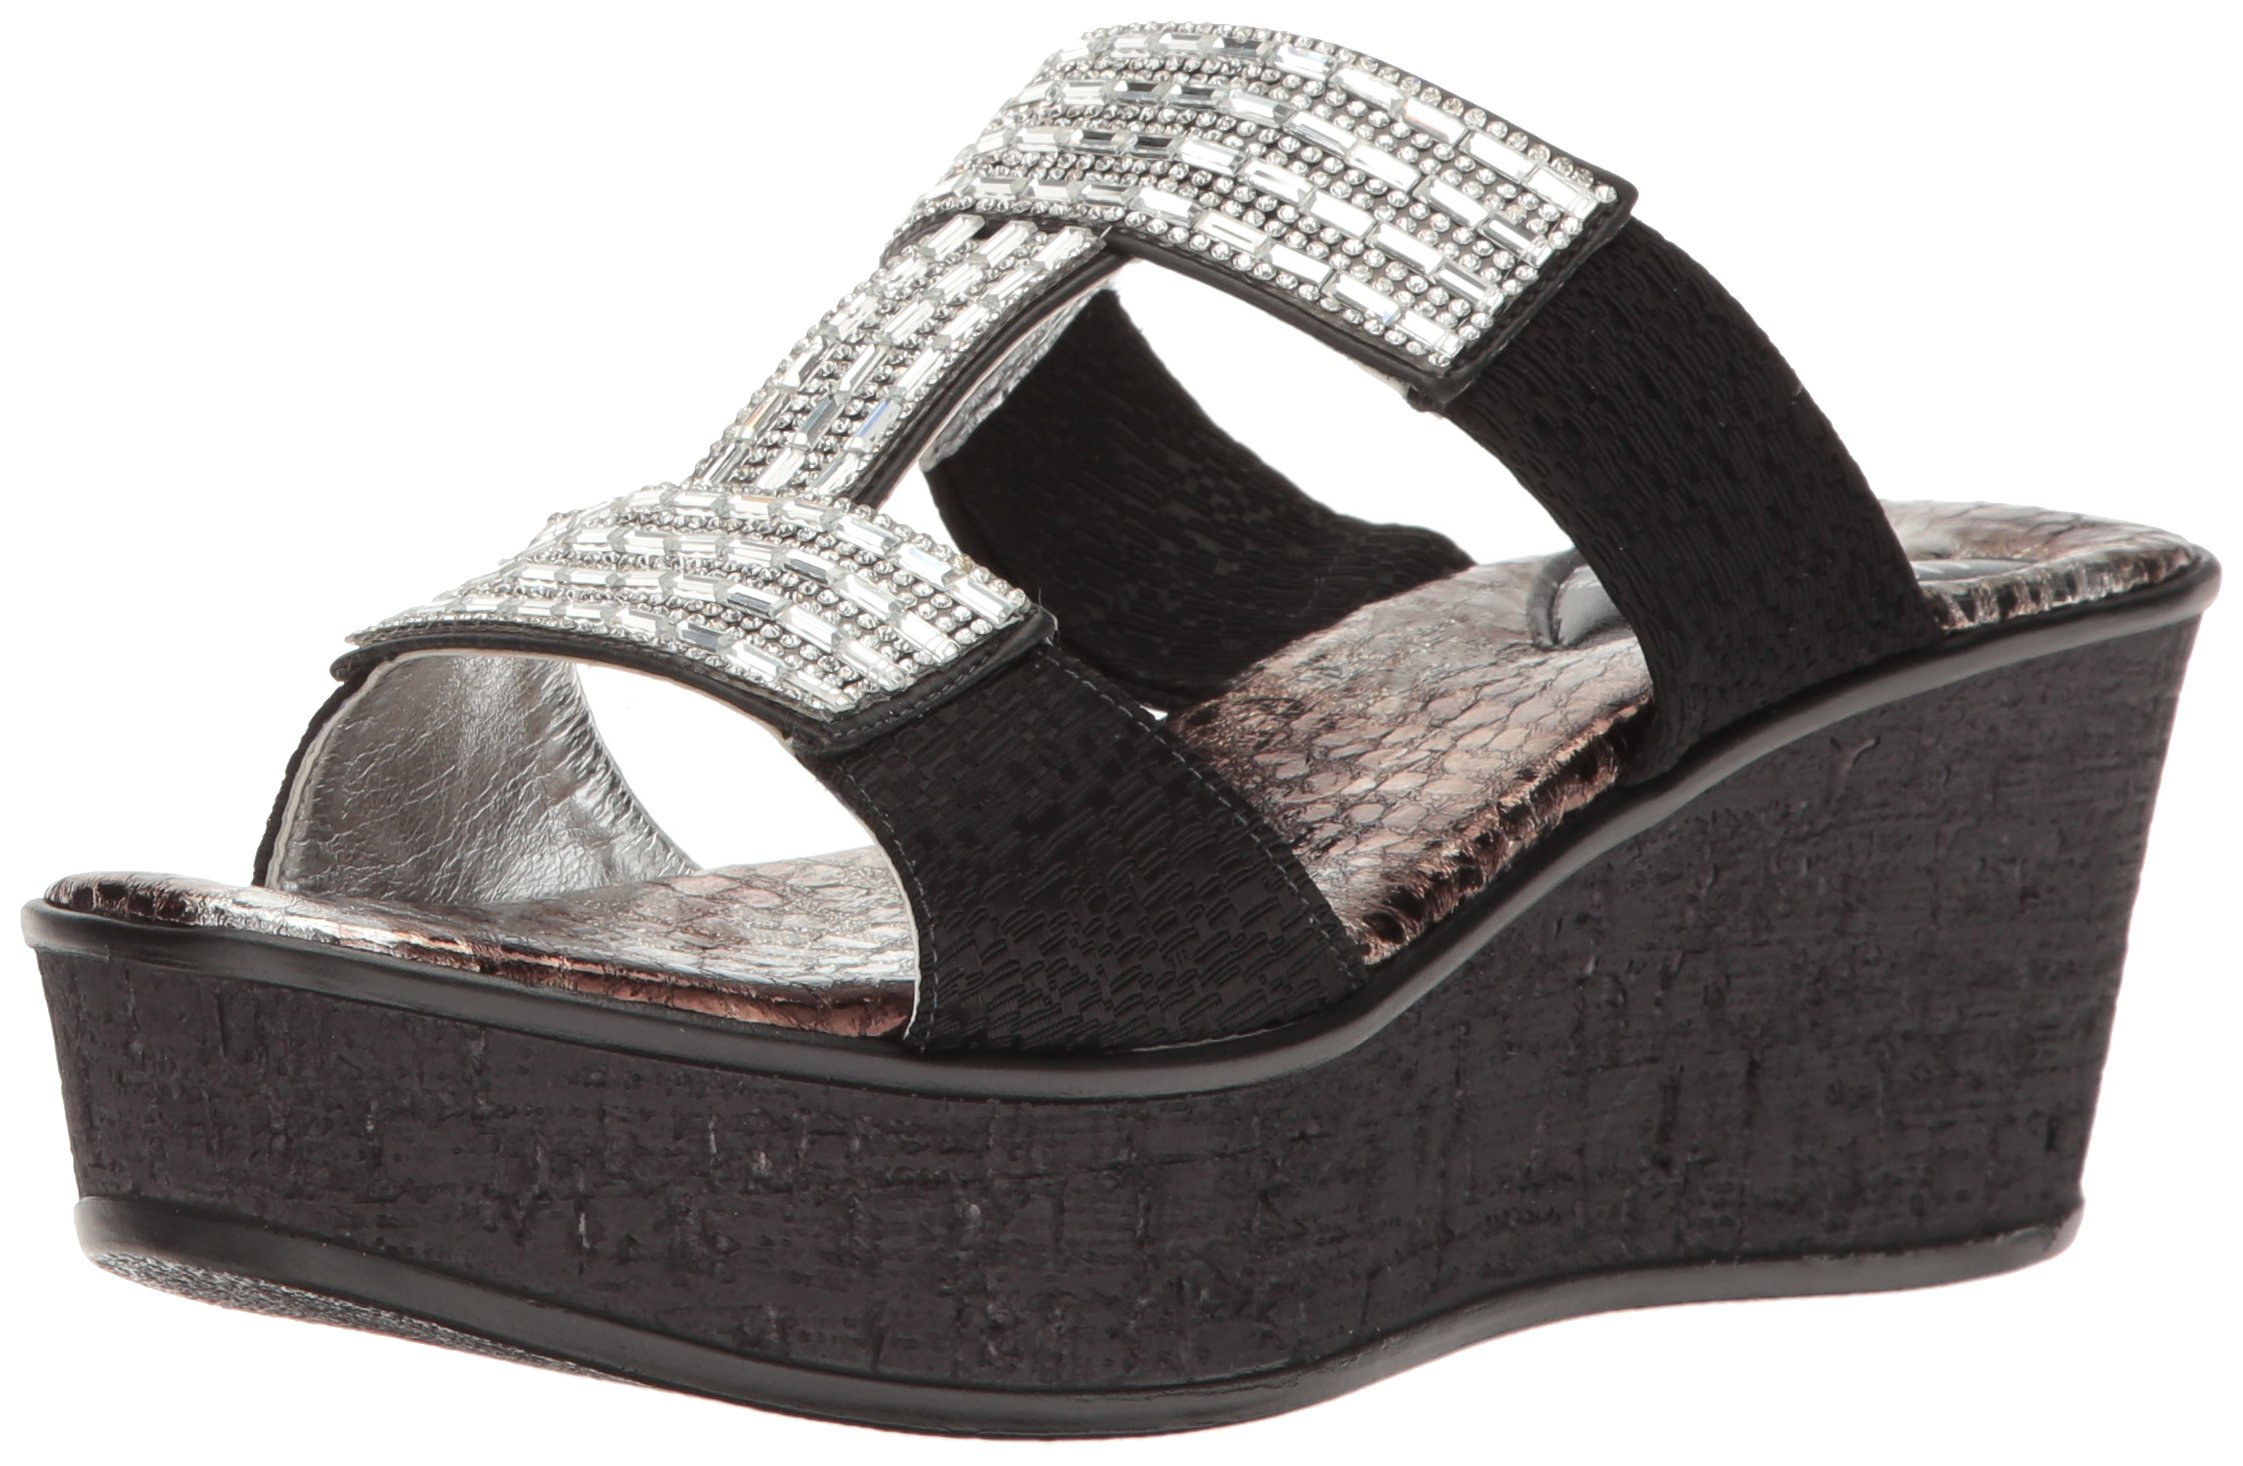 Love & Liberty Women's Sai-Ll Wedge Sandal, Black, 10 M US